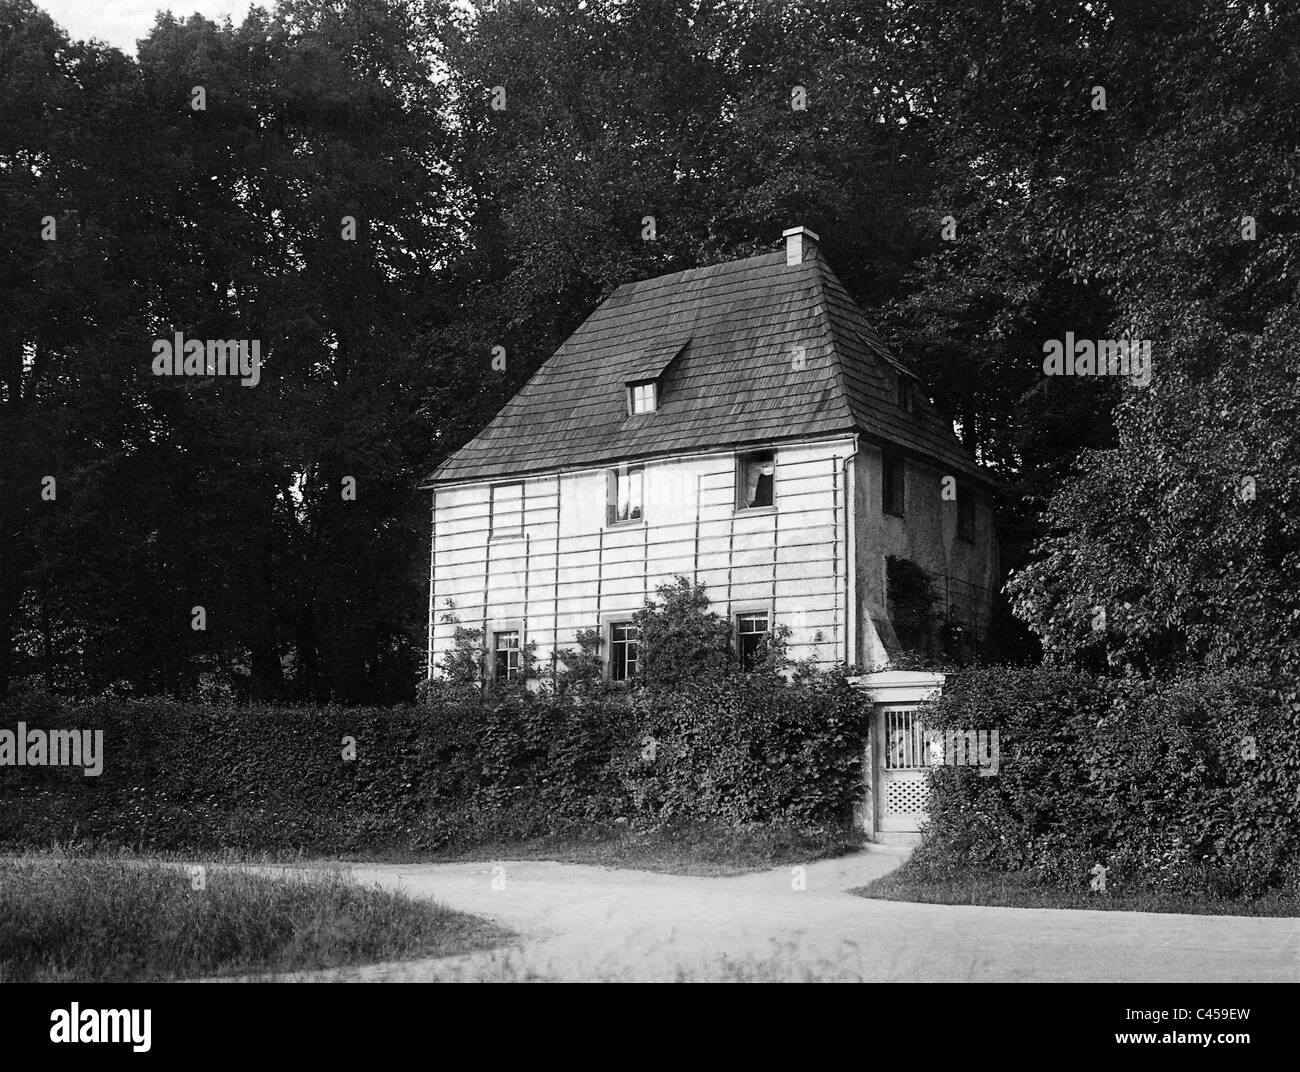 weimar 1919 stockfotos weimar 1919 bilder alamy. Black Bedroom Furniture Sets. Home Design Ideas